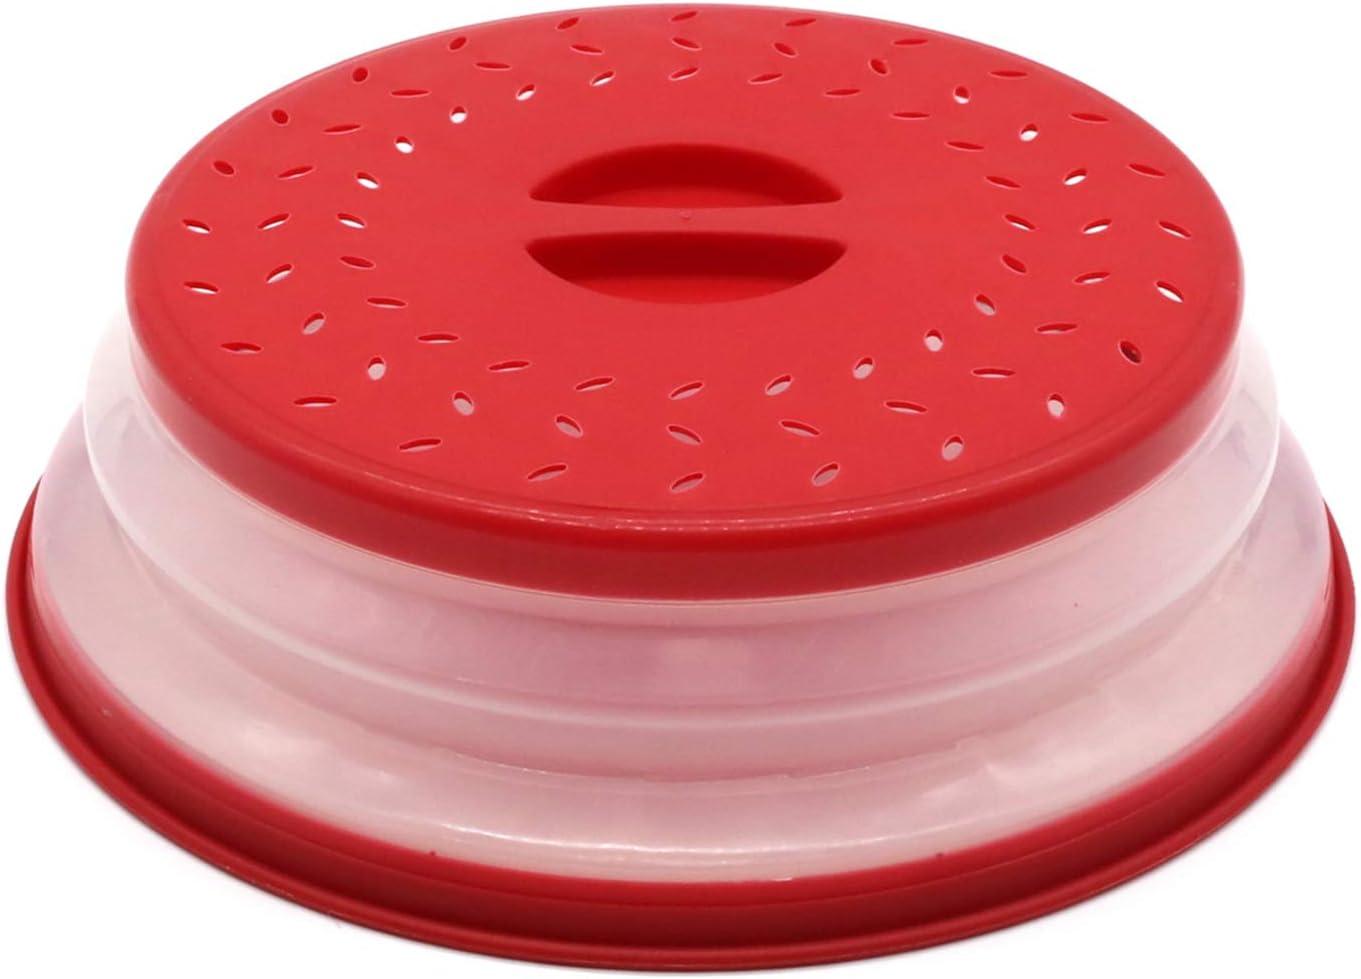 Nifogo Tapa para microondas Plegable Colador Plegable para Platos de microondas colador colador para Frutas Verduras, Bap Libre y no Tóxico (Rojo)